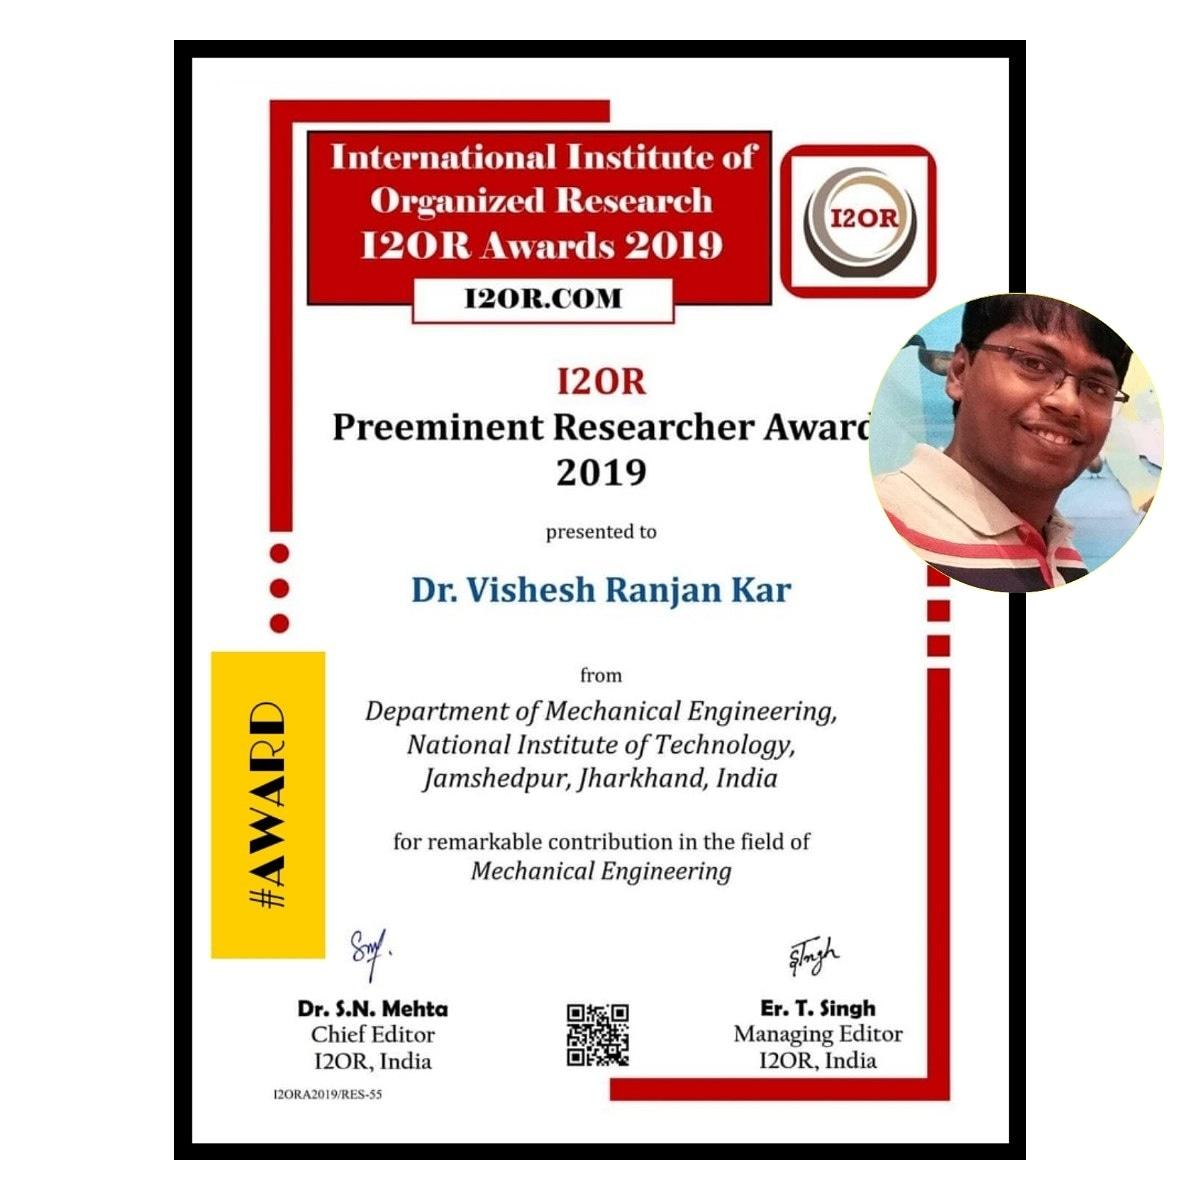 Congrats Dr. Vishesh Ranjan Kar pic.twitter.com/m7KTEJqXnq – at NIT Jamshedpur Library